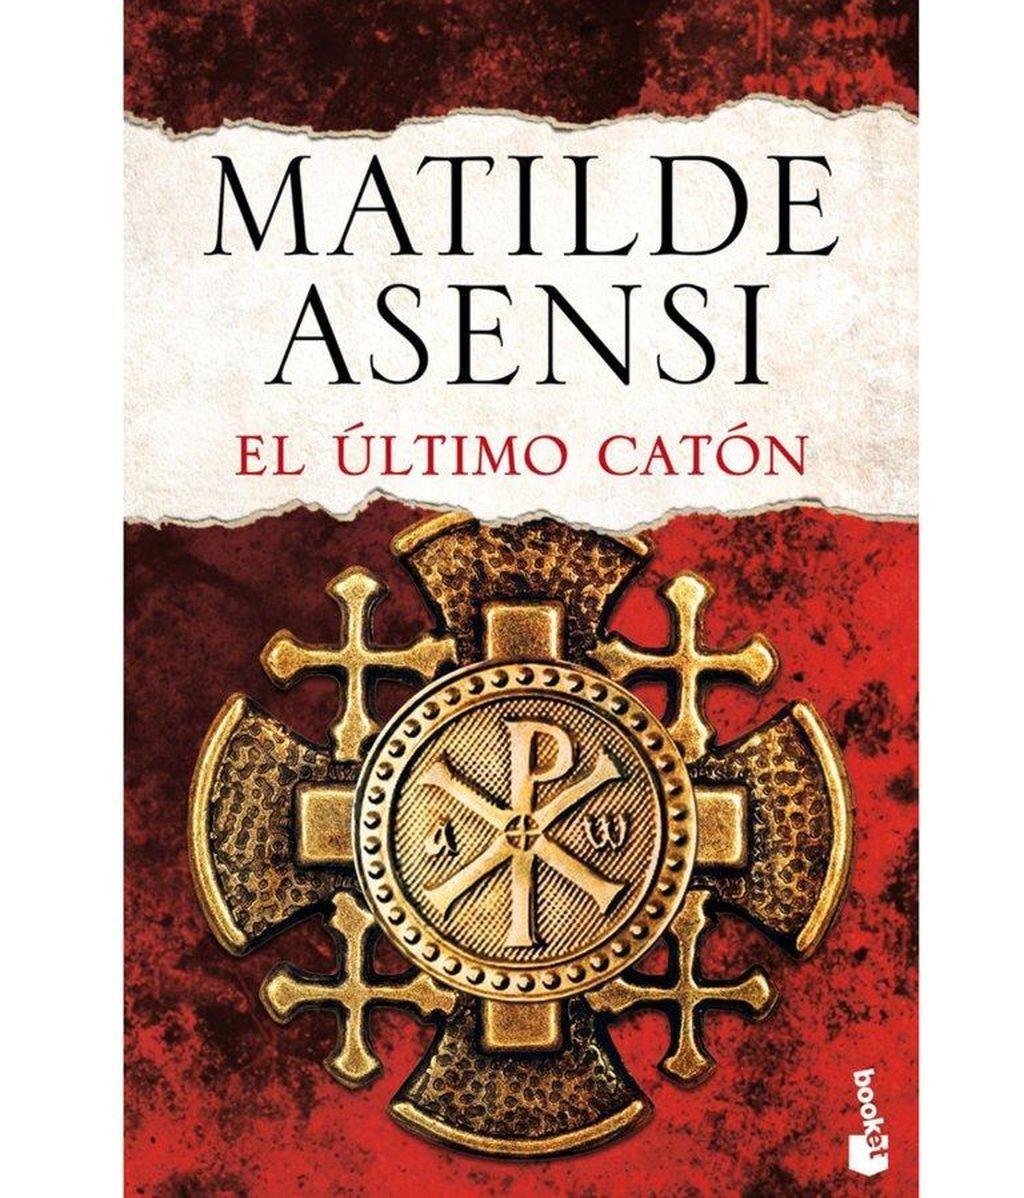 el-ultimo-caton-matilde-asensi-1281894_l